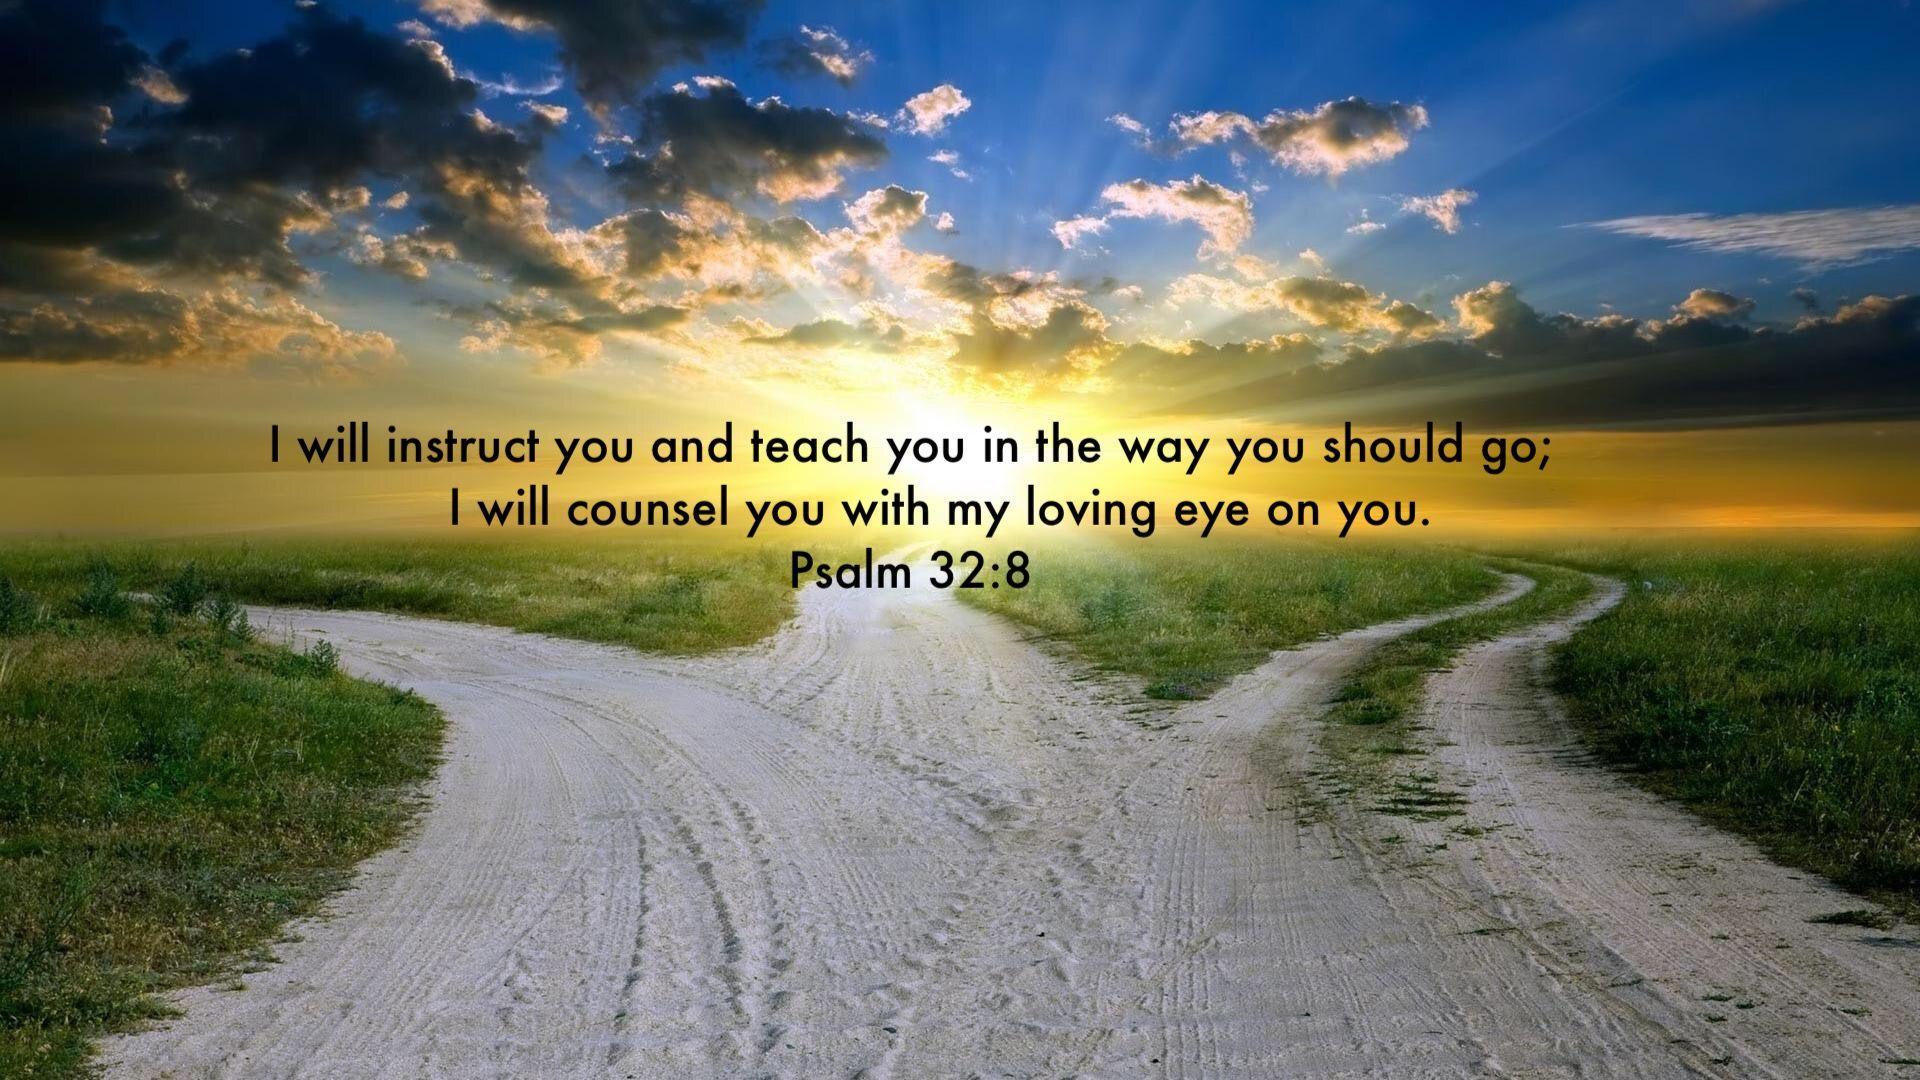 Psalm 32:8 | Decisions determine destiny, Christian wallpaper ...